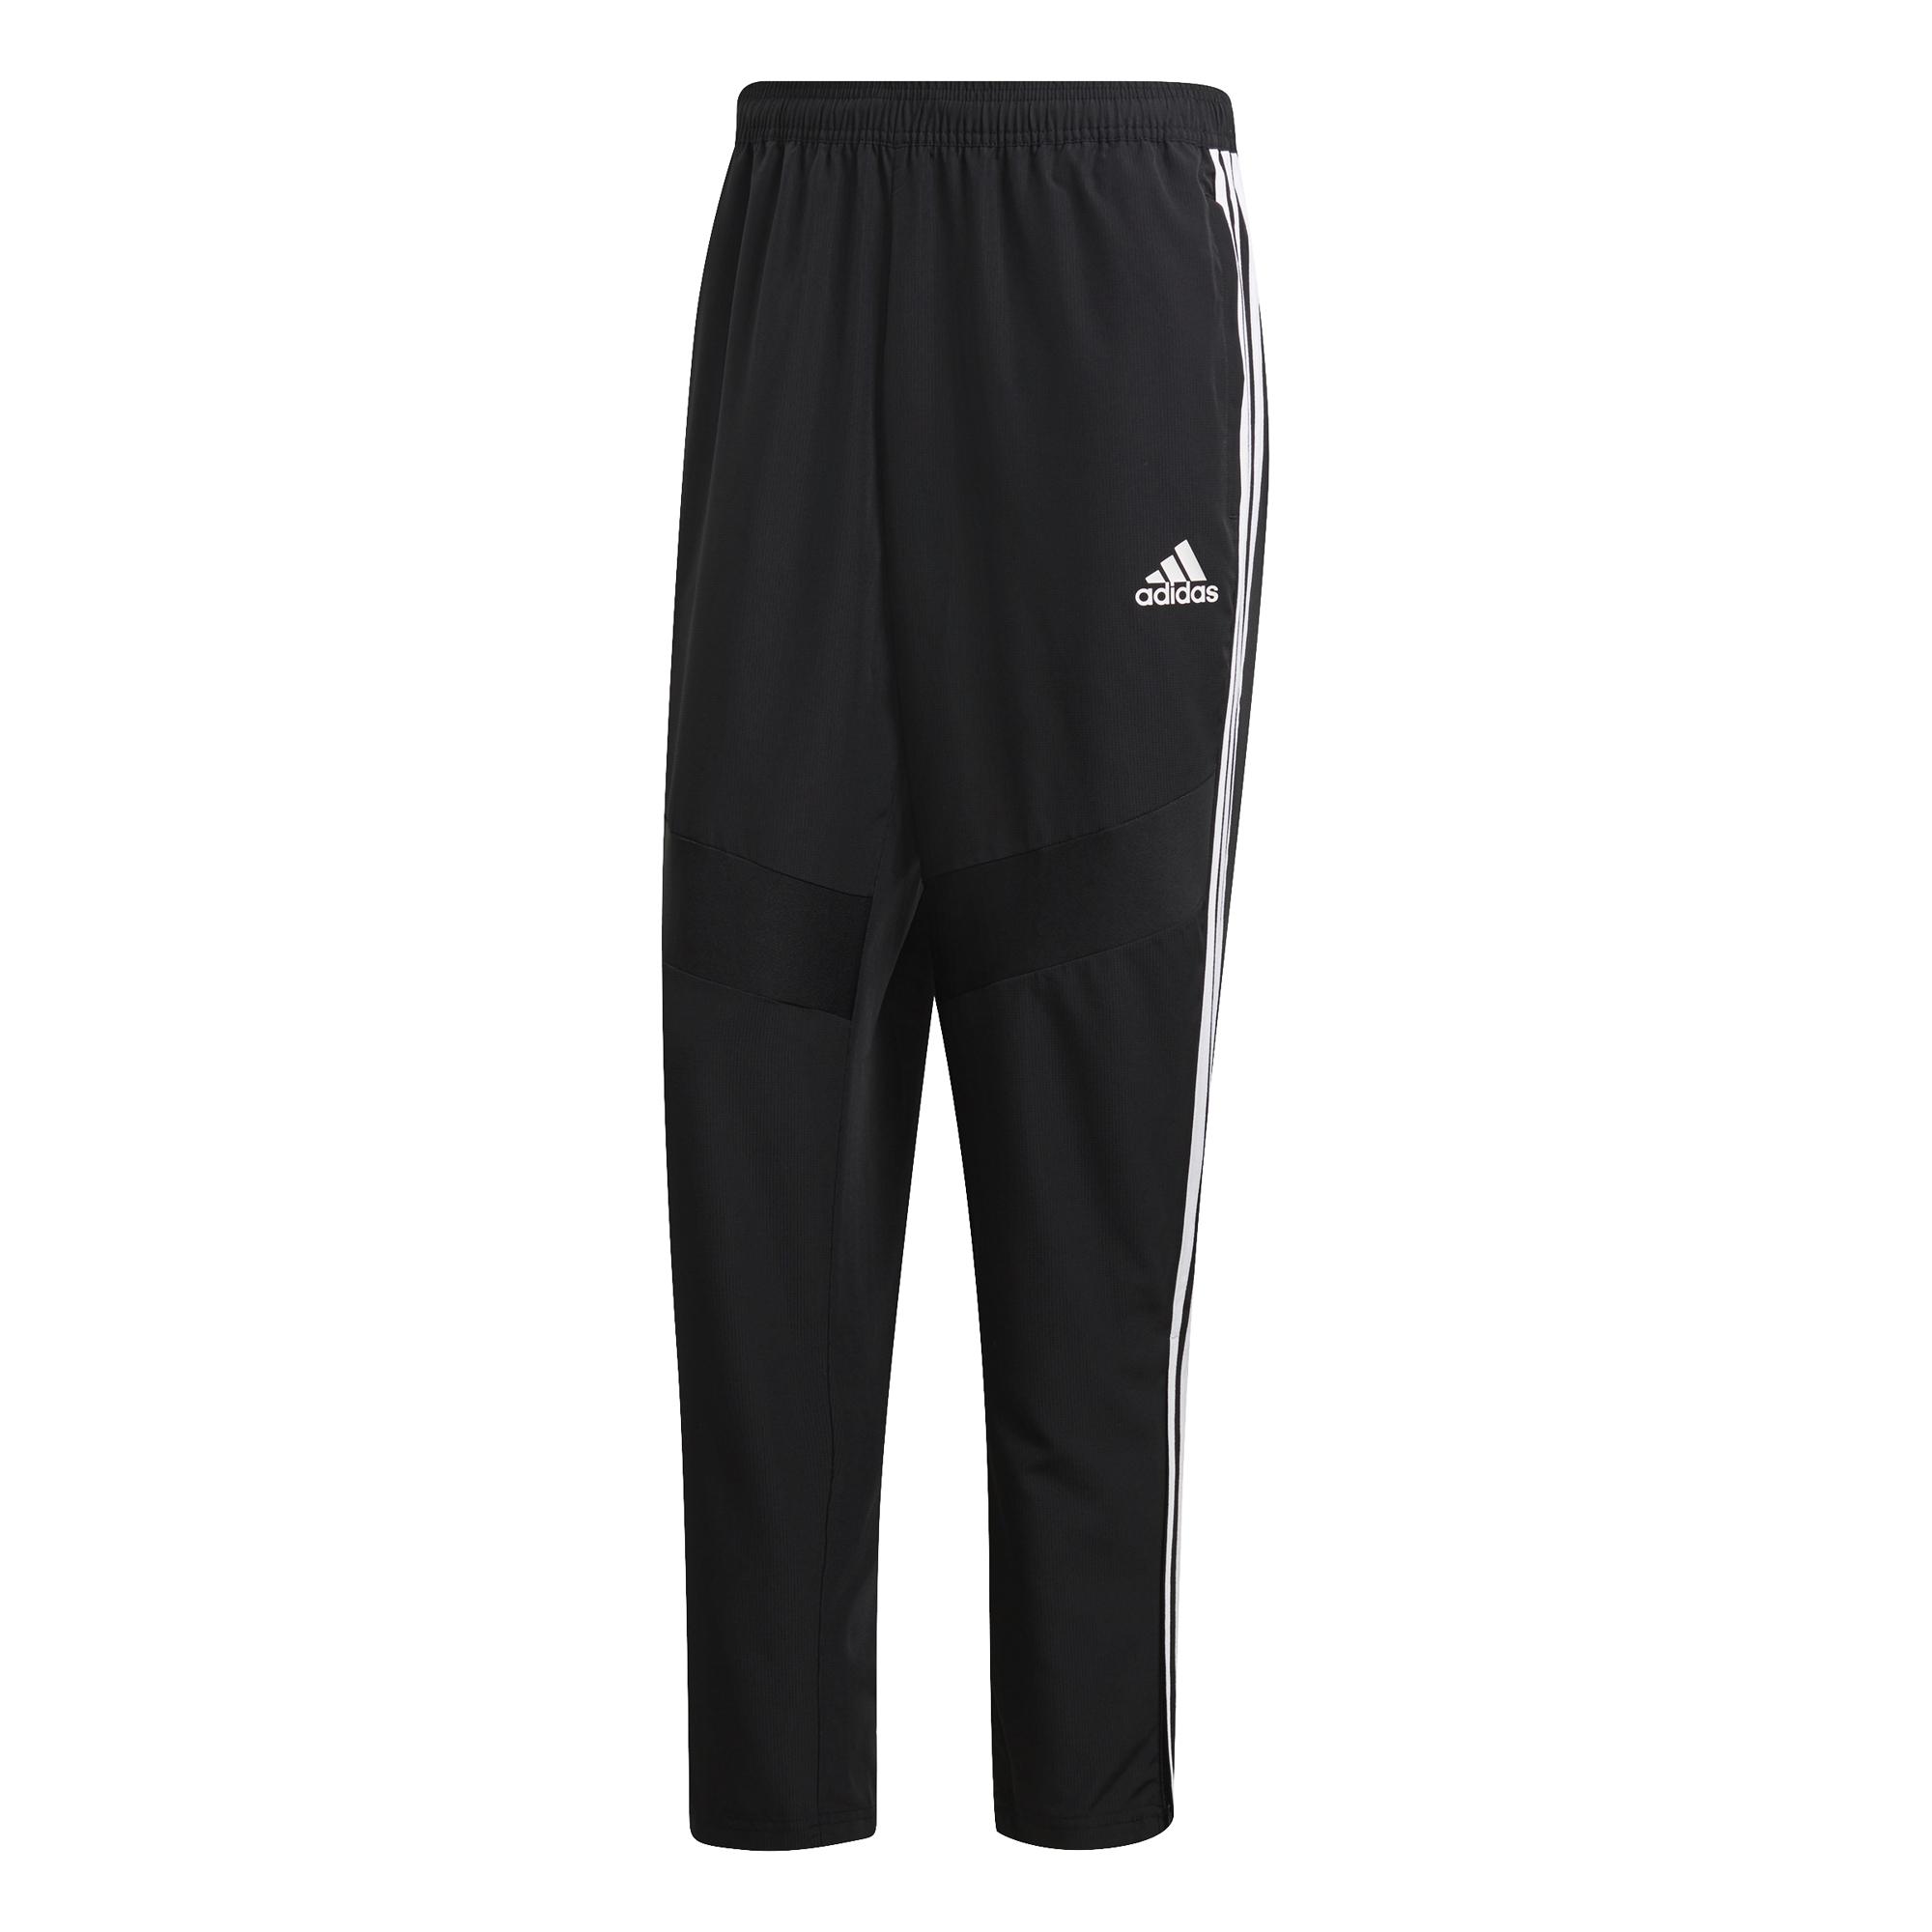 ADIDAS kalhoty Tiro 19 Woven Pants